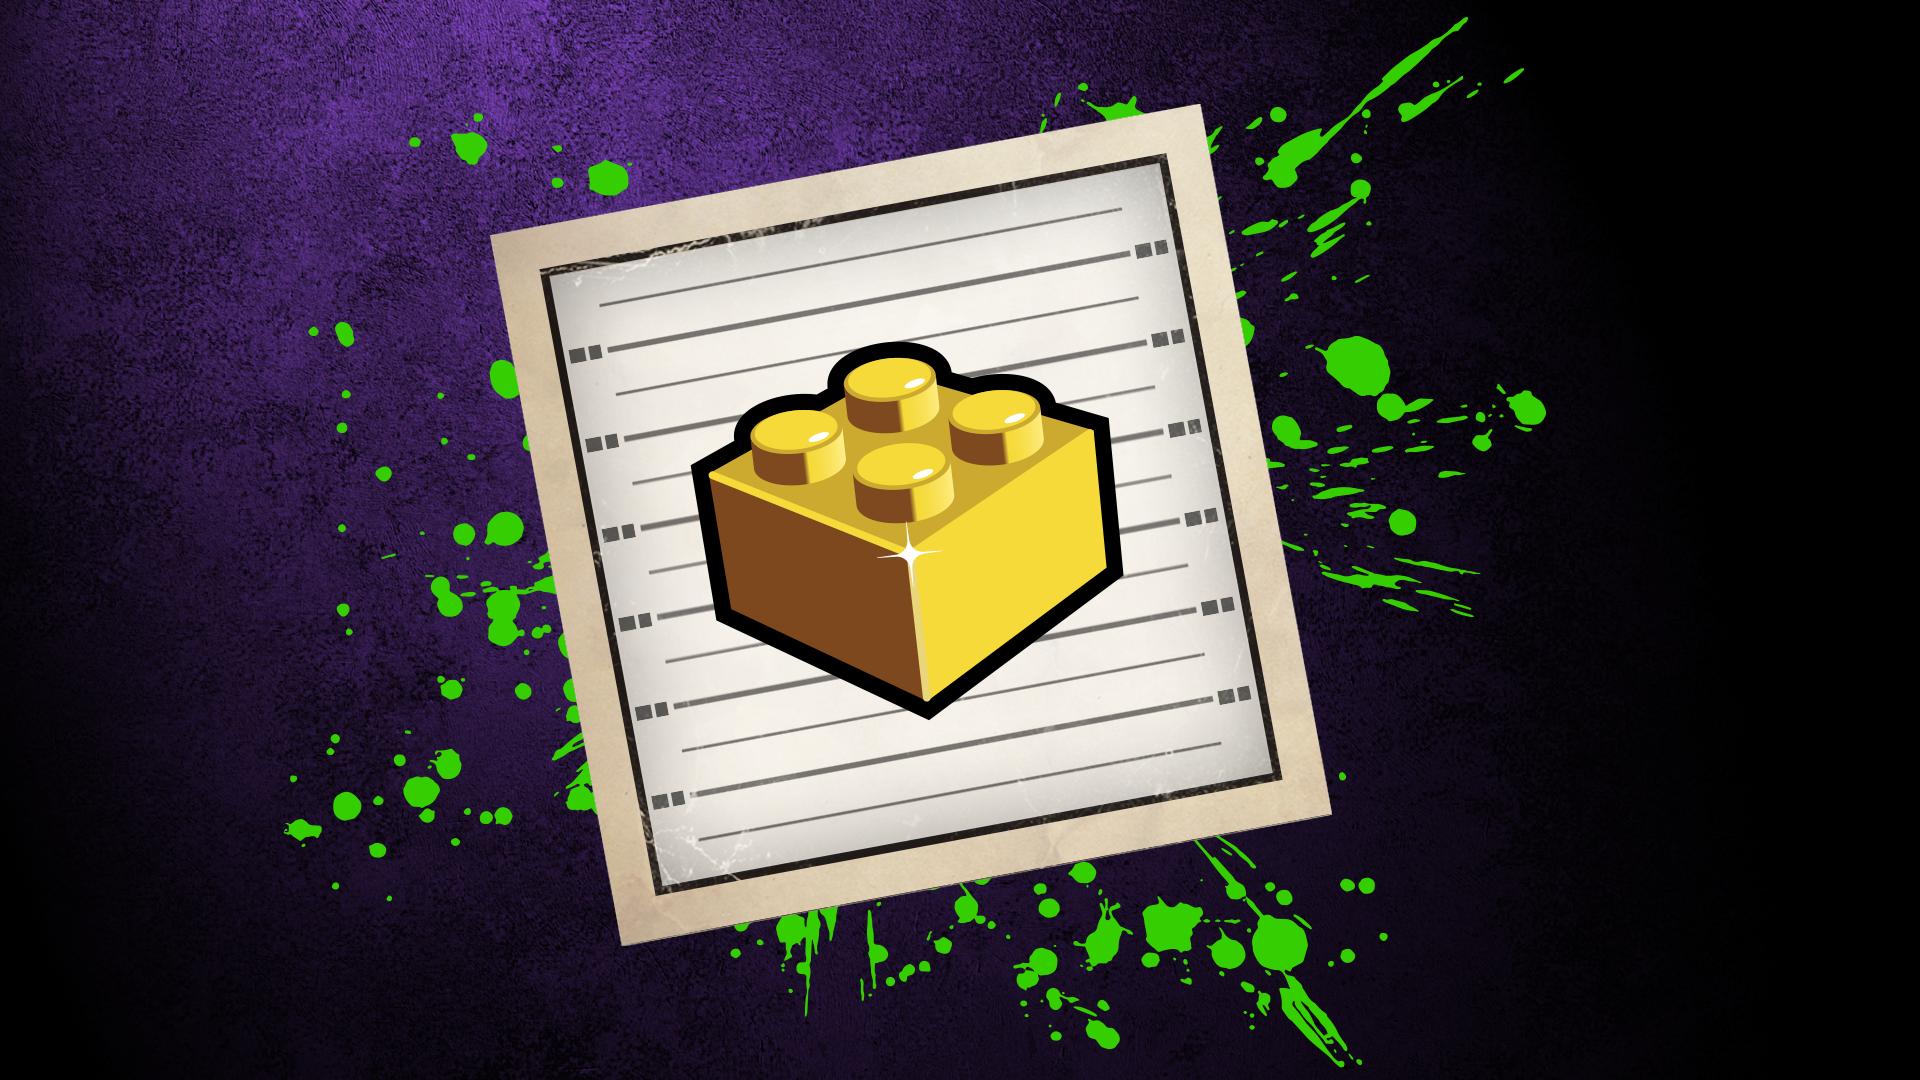 Icon for Do you like Gold bricks, Batman?